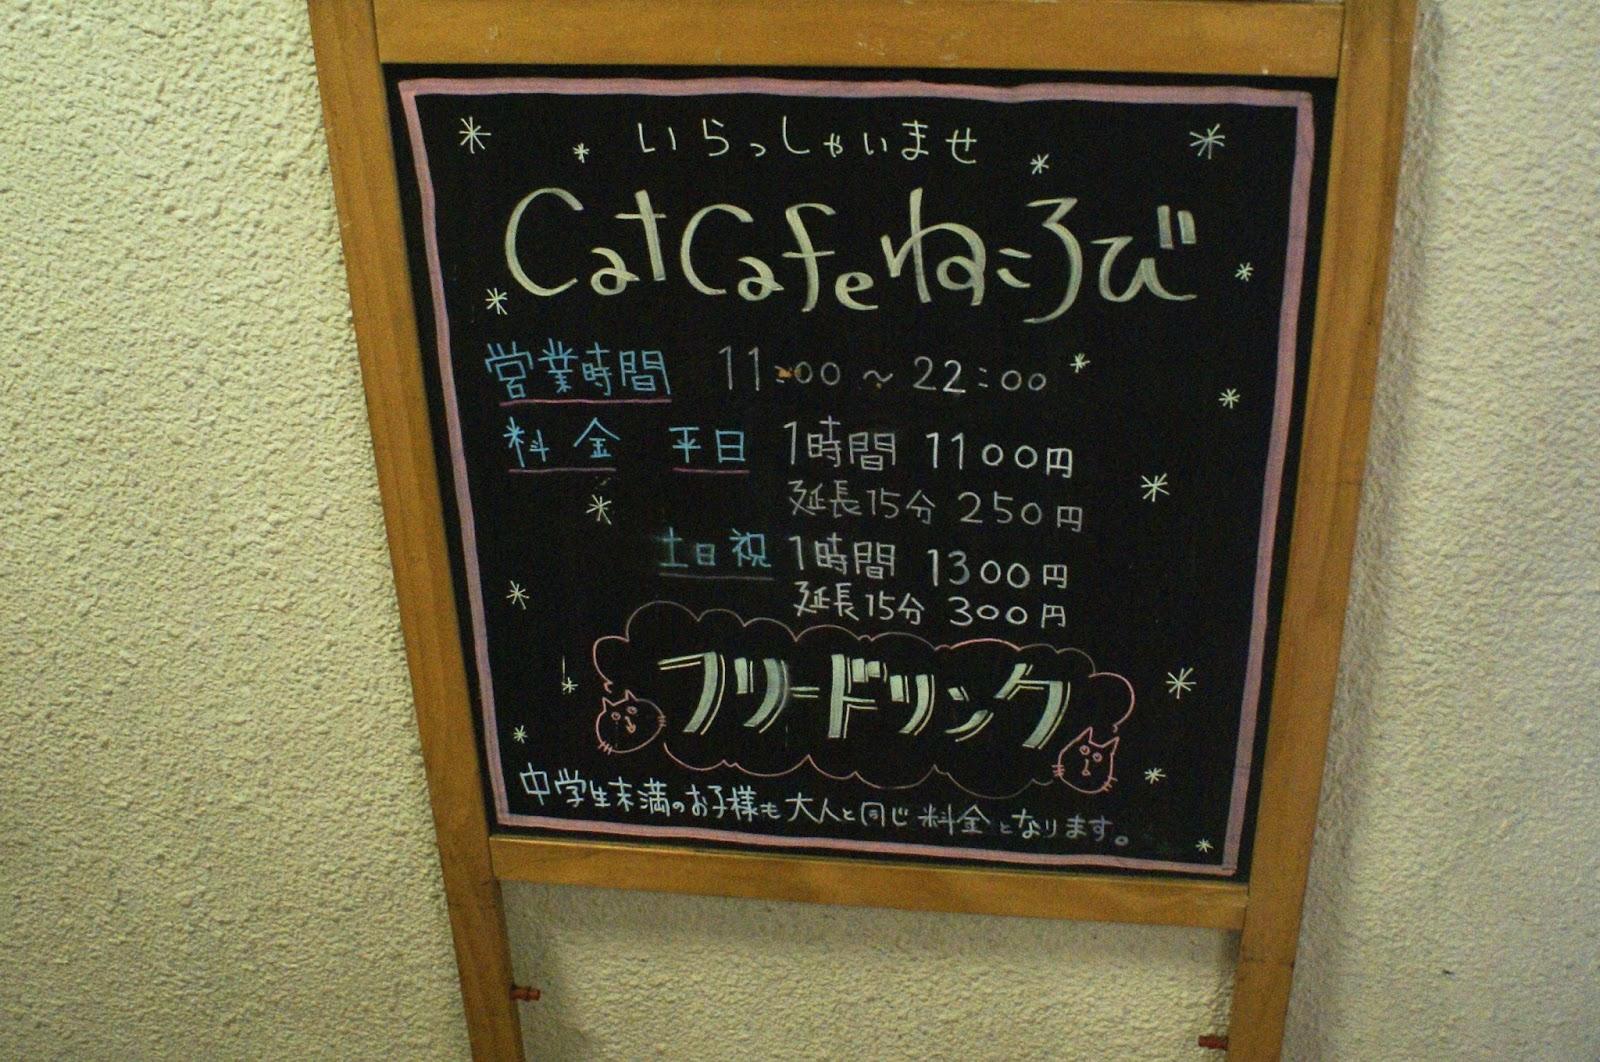 neko cat café nekorobi ikebukuro tokyo japan